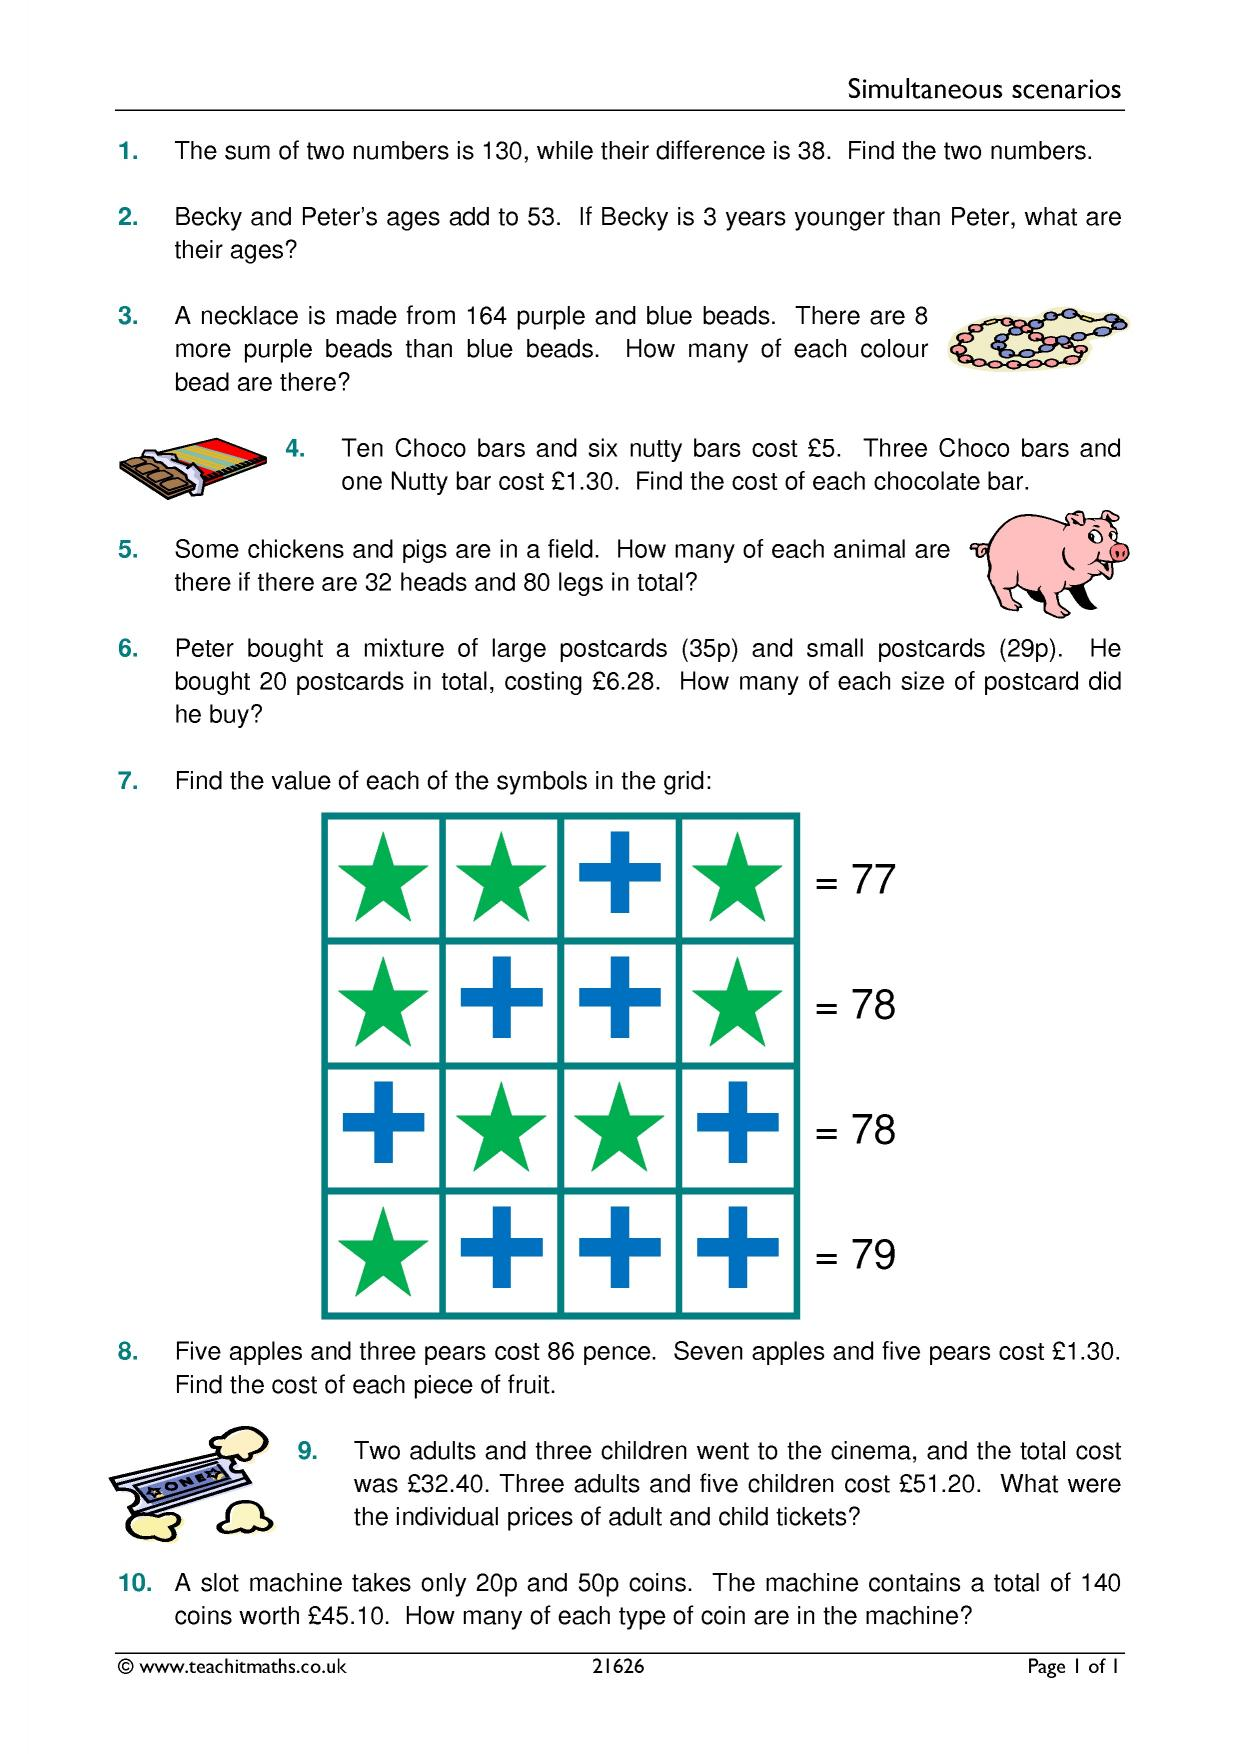 Simple Simultaneous Equations Worksheet